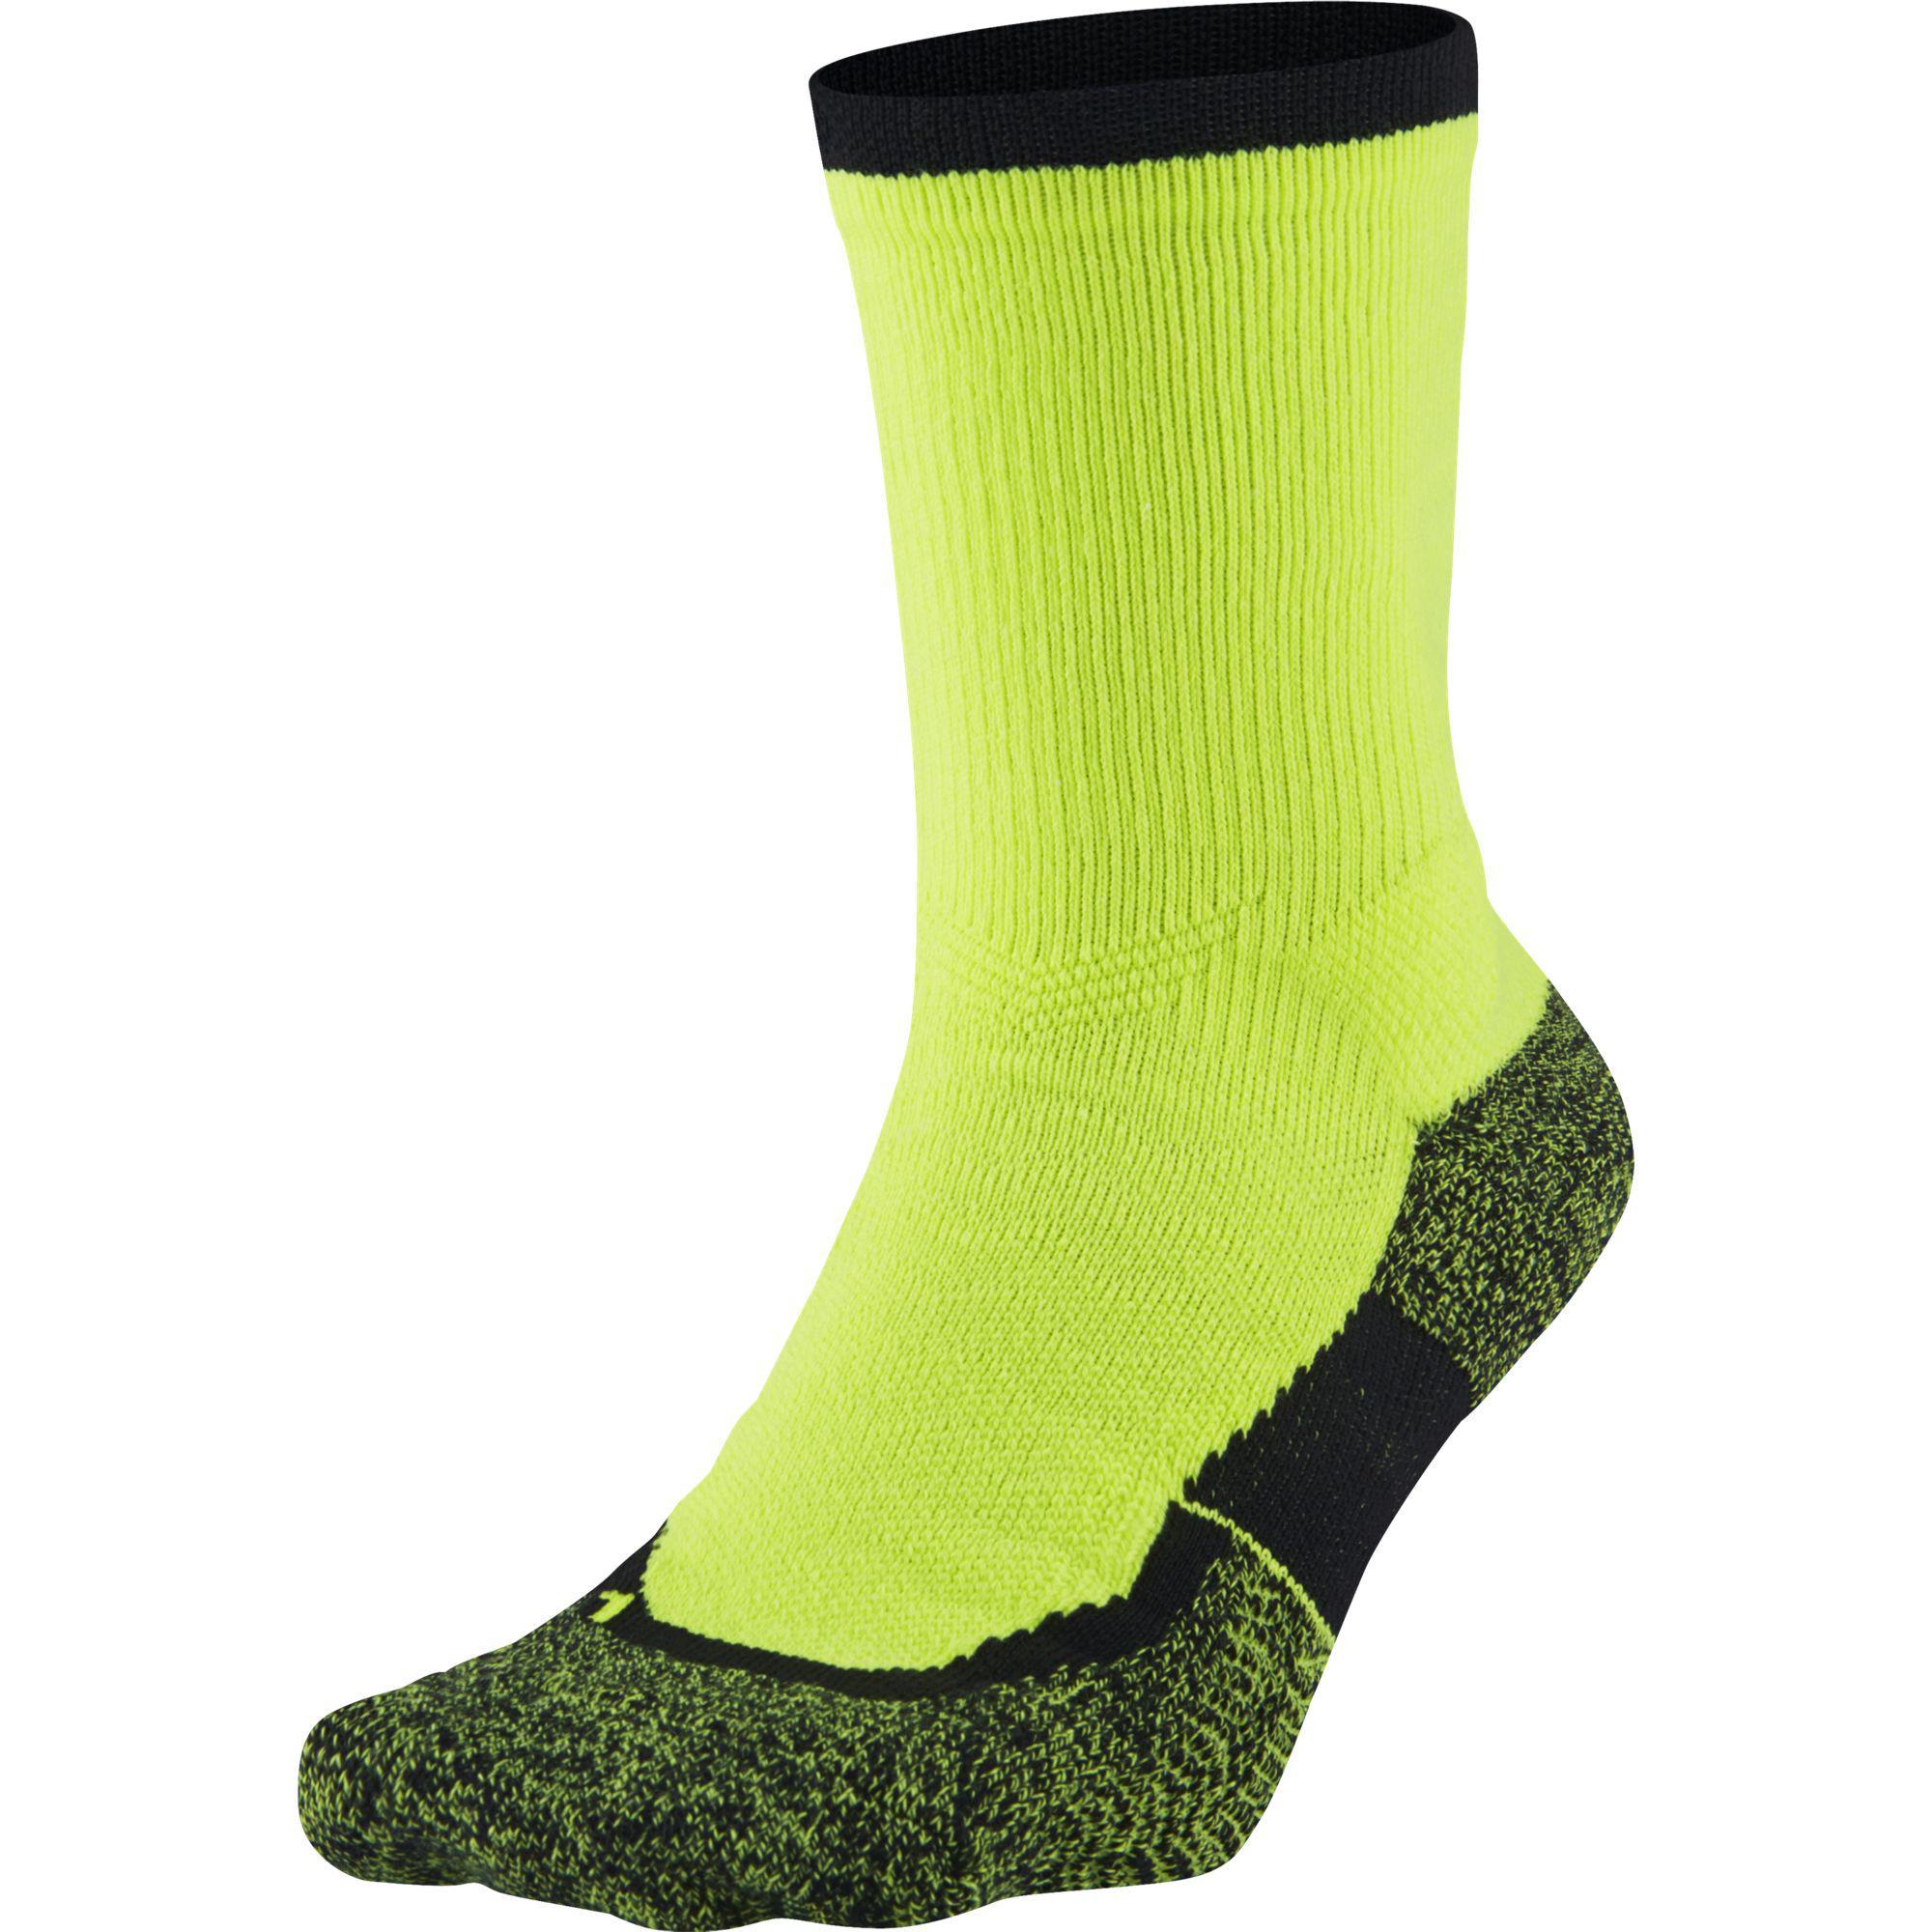 67b60300e Nike Elite Crew Tennis Socks (1 Pair) - Volt/Black - Tennisnuts.com